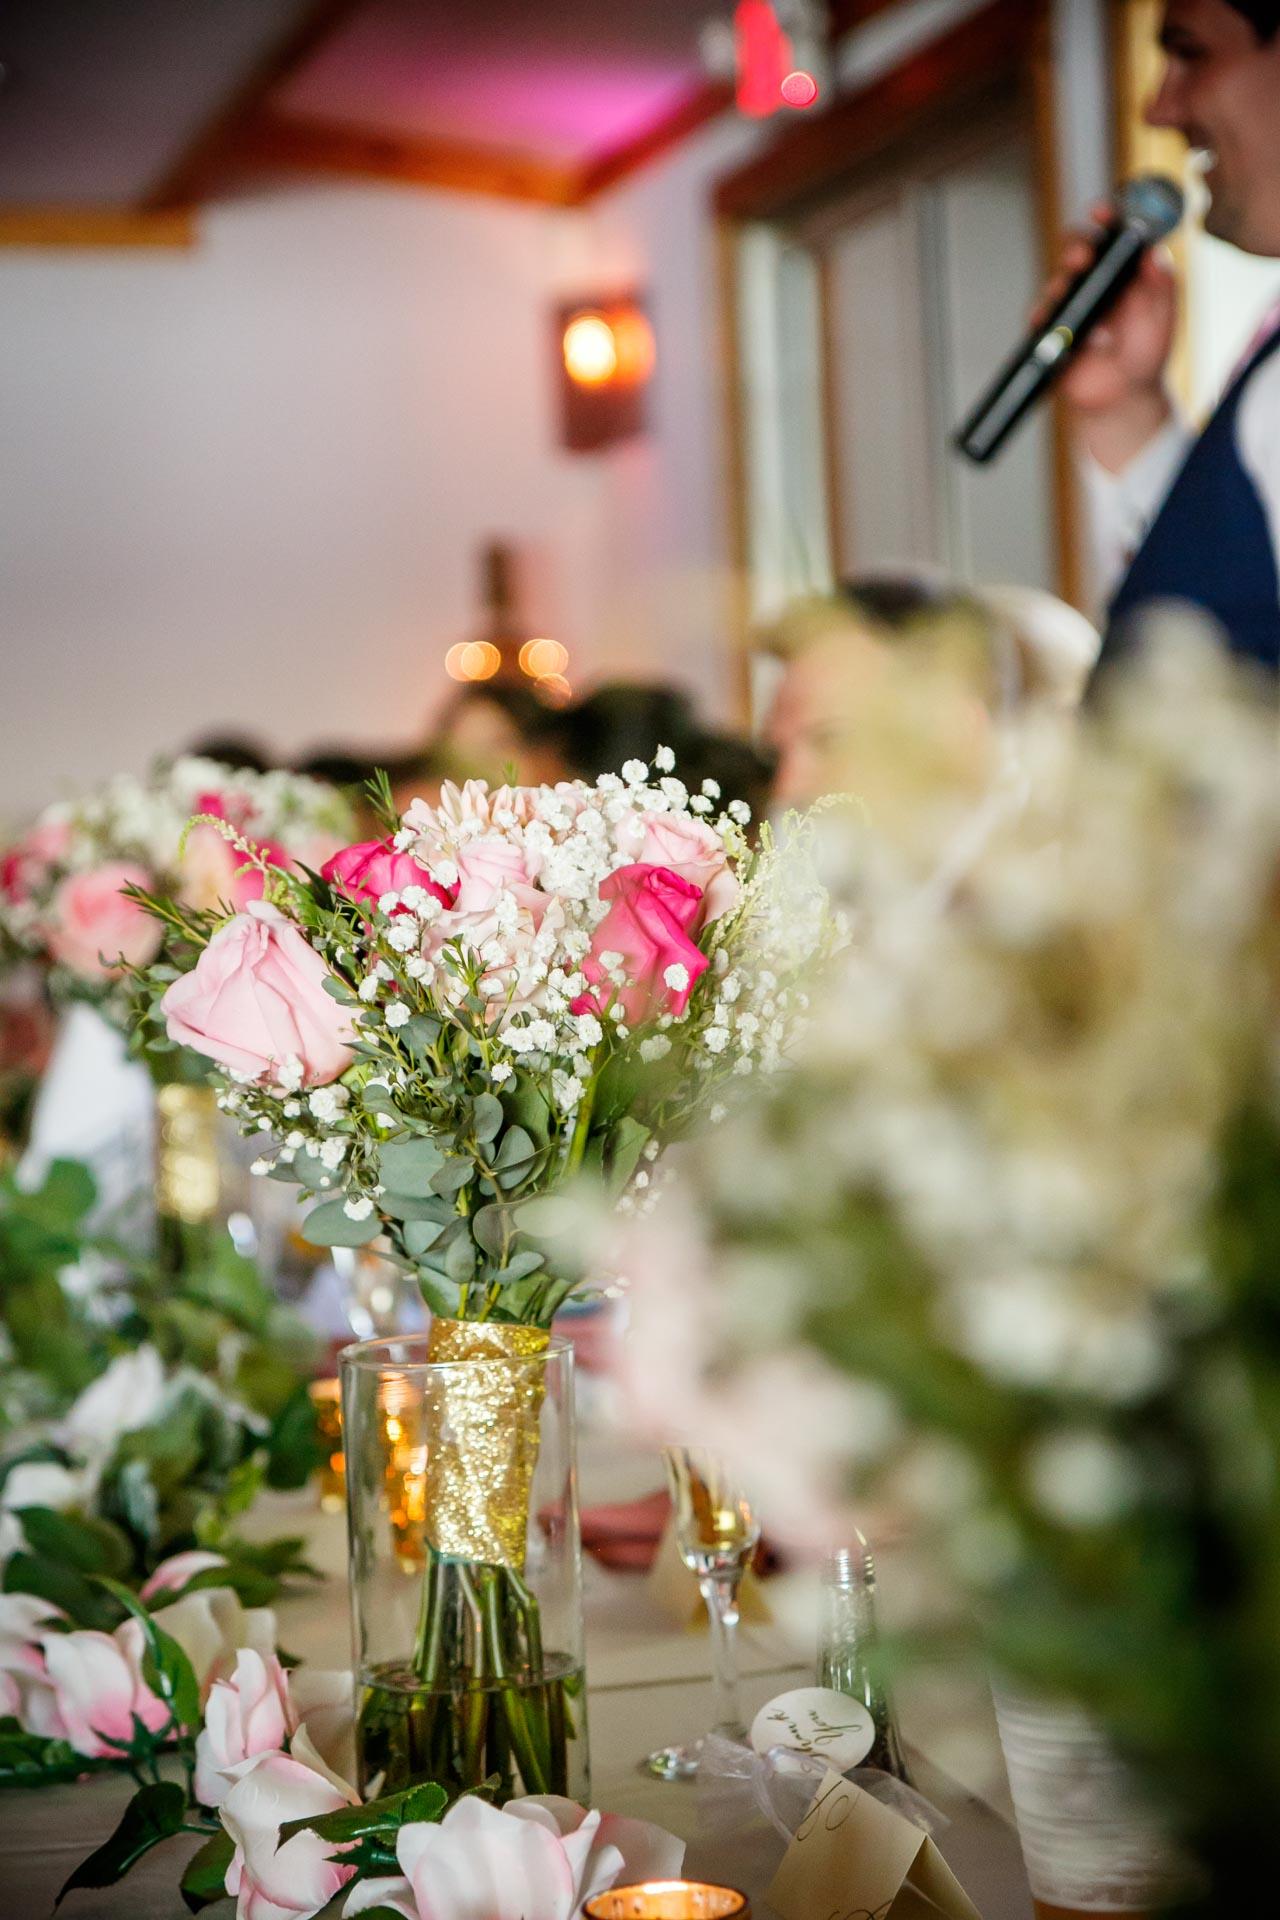 aud-mar-banquet-hall-muskego-wi-adam-shea-photography-green-bay-appleton-neenah-photographer-74.jpg